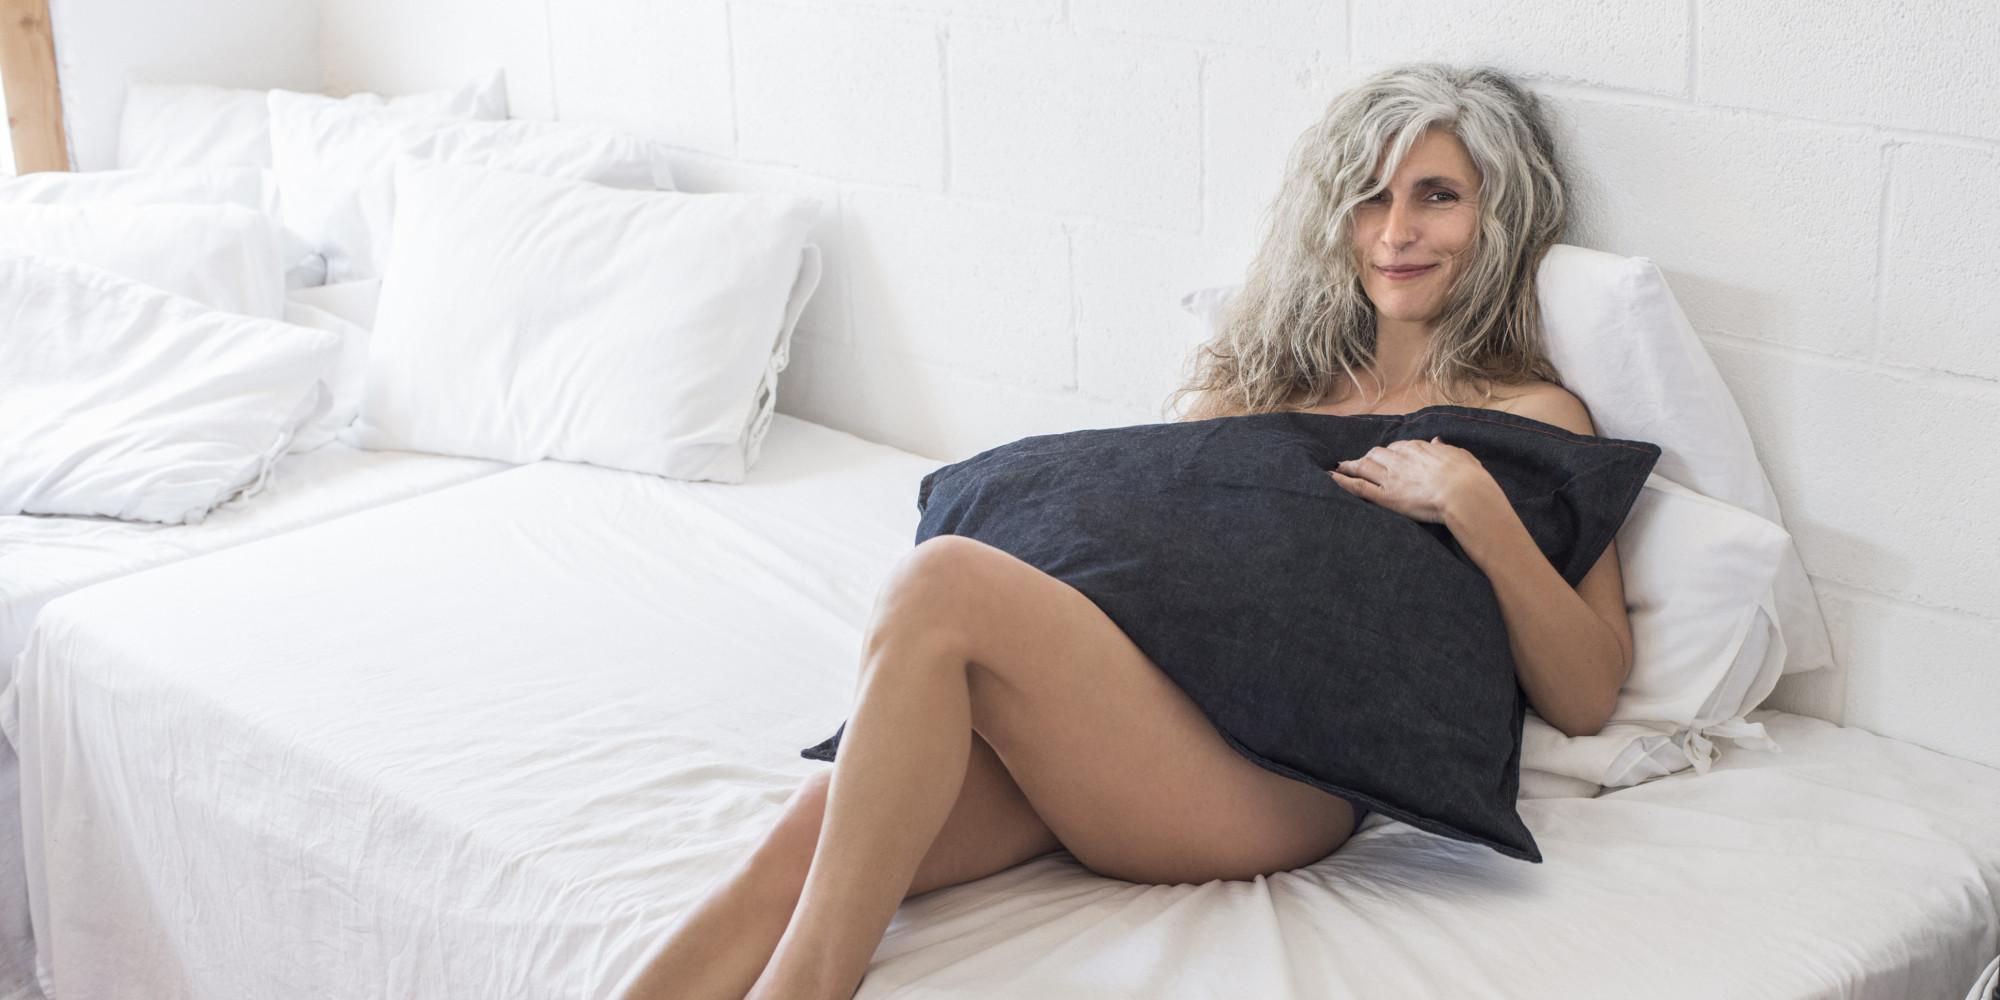 Scheduled Seeking Man Woman Affair 55 To Kinky 50